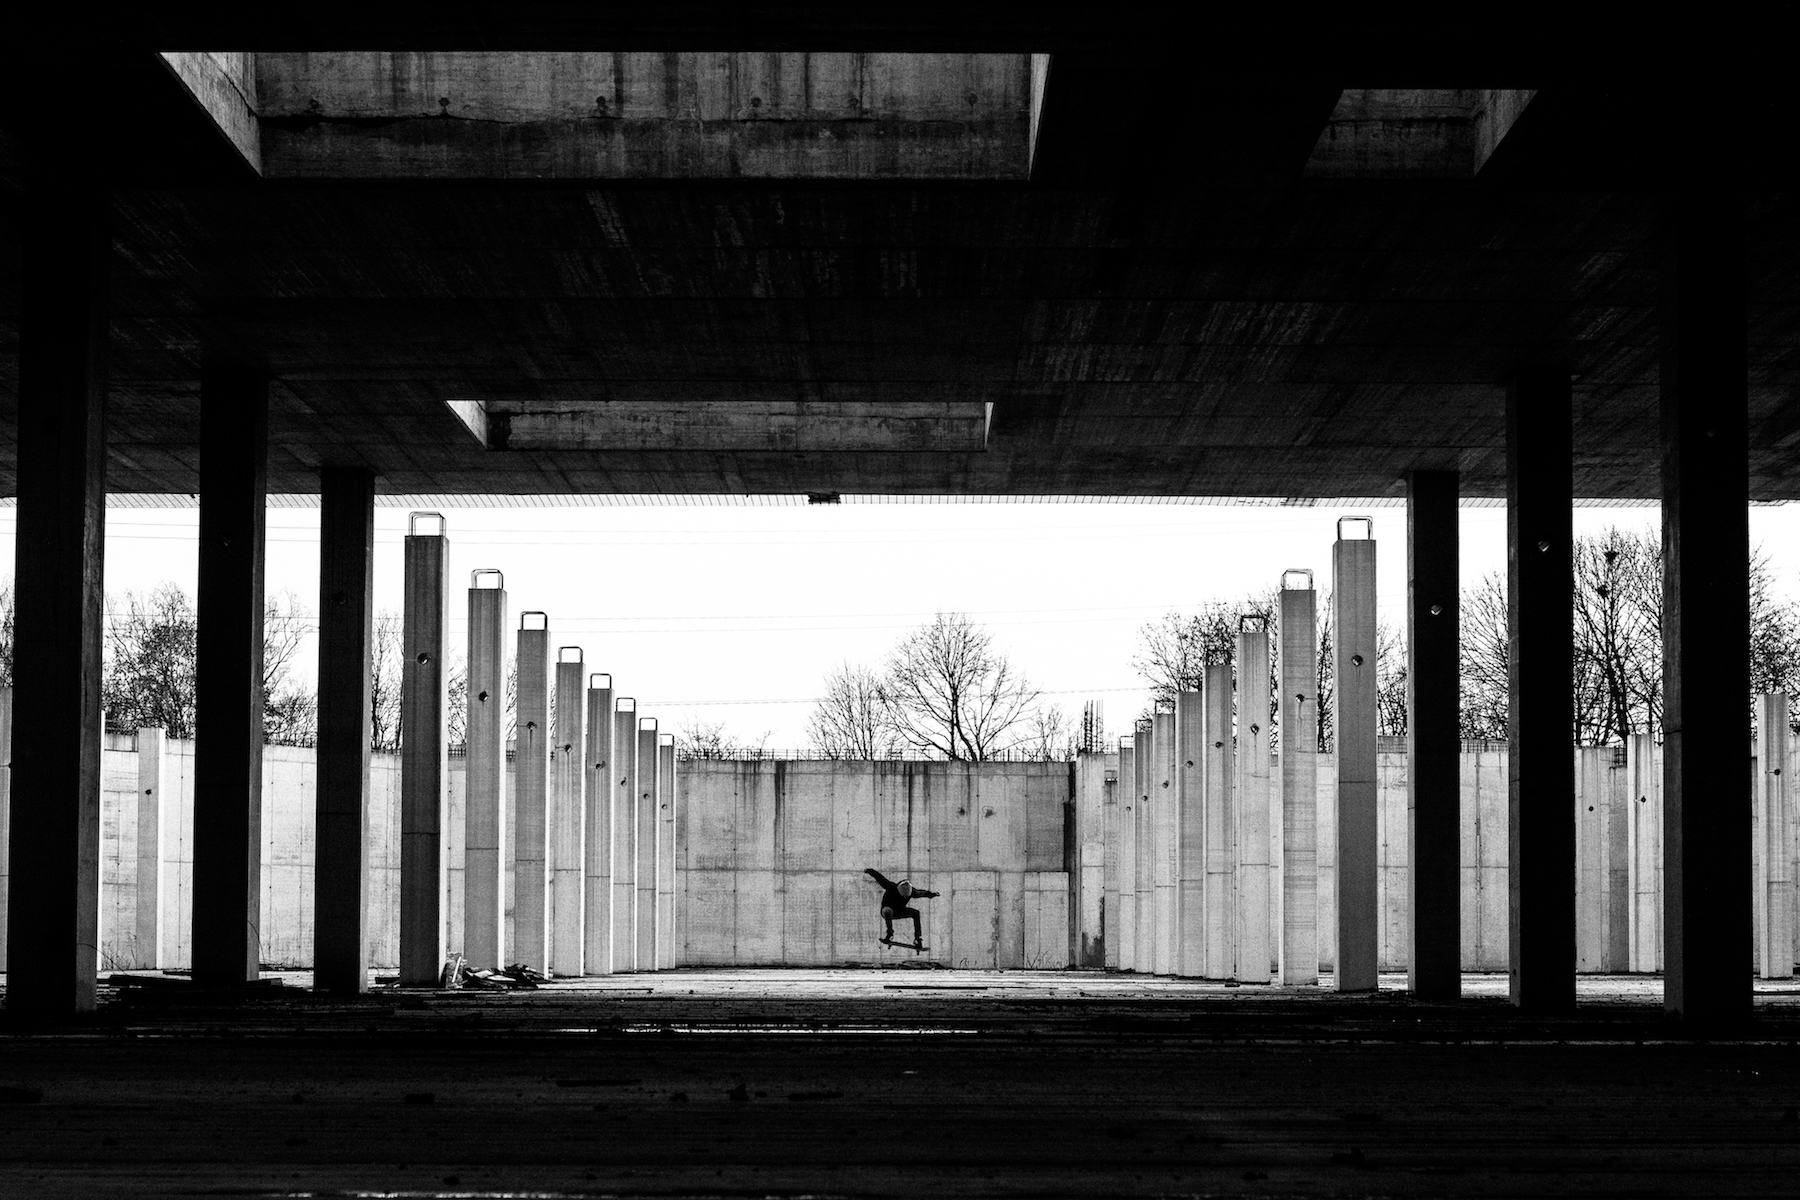 luke-paige-skate-photography-07